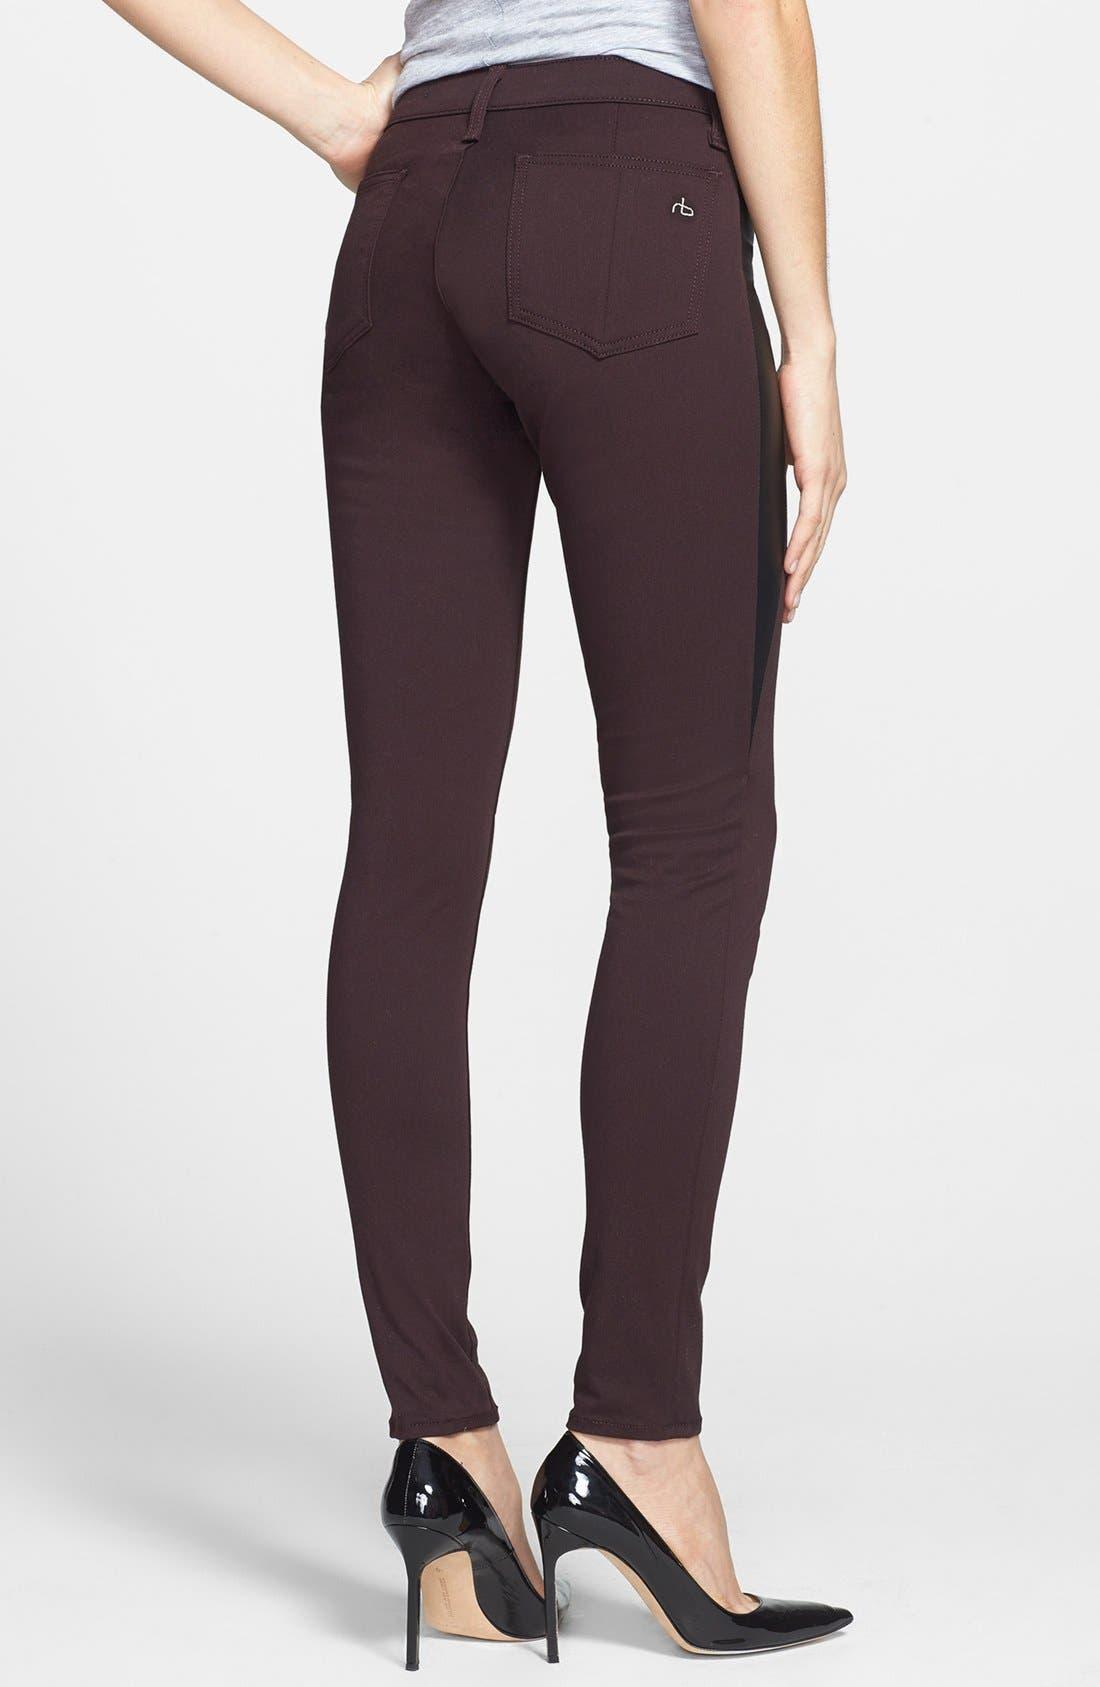 Alternate Image 2  - rag & bone/JEAN 'Pop' Leather Inset Skinny Jeans (Wine)